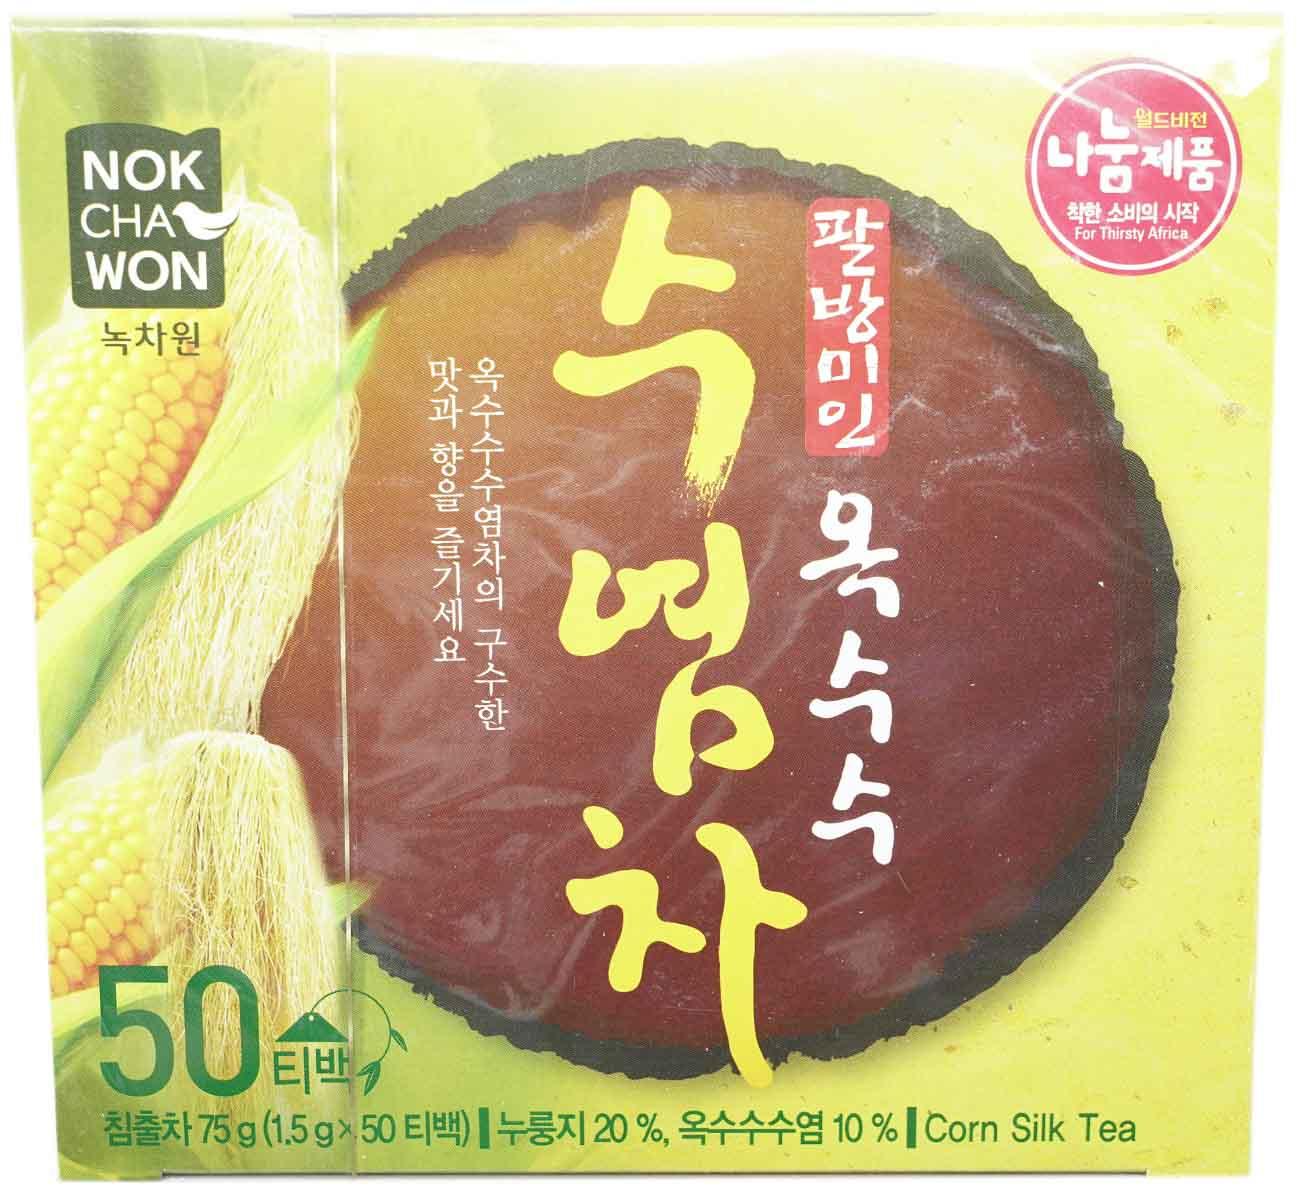 Nokchawon Maisseide-Tee, 50 Beutel je 1,5 g